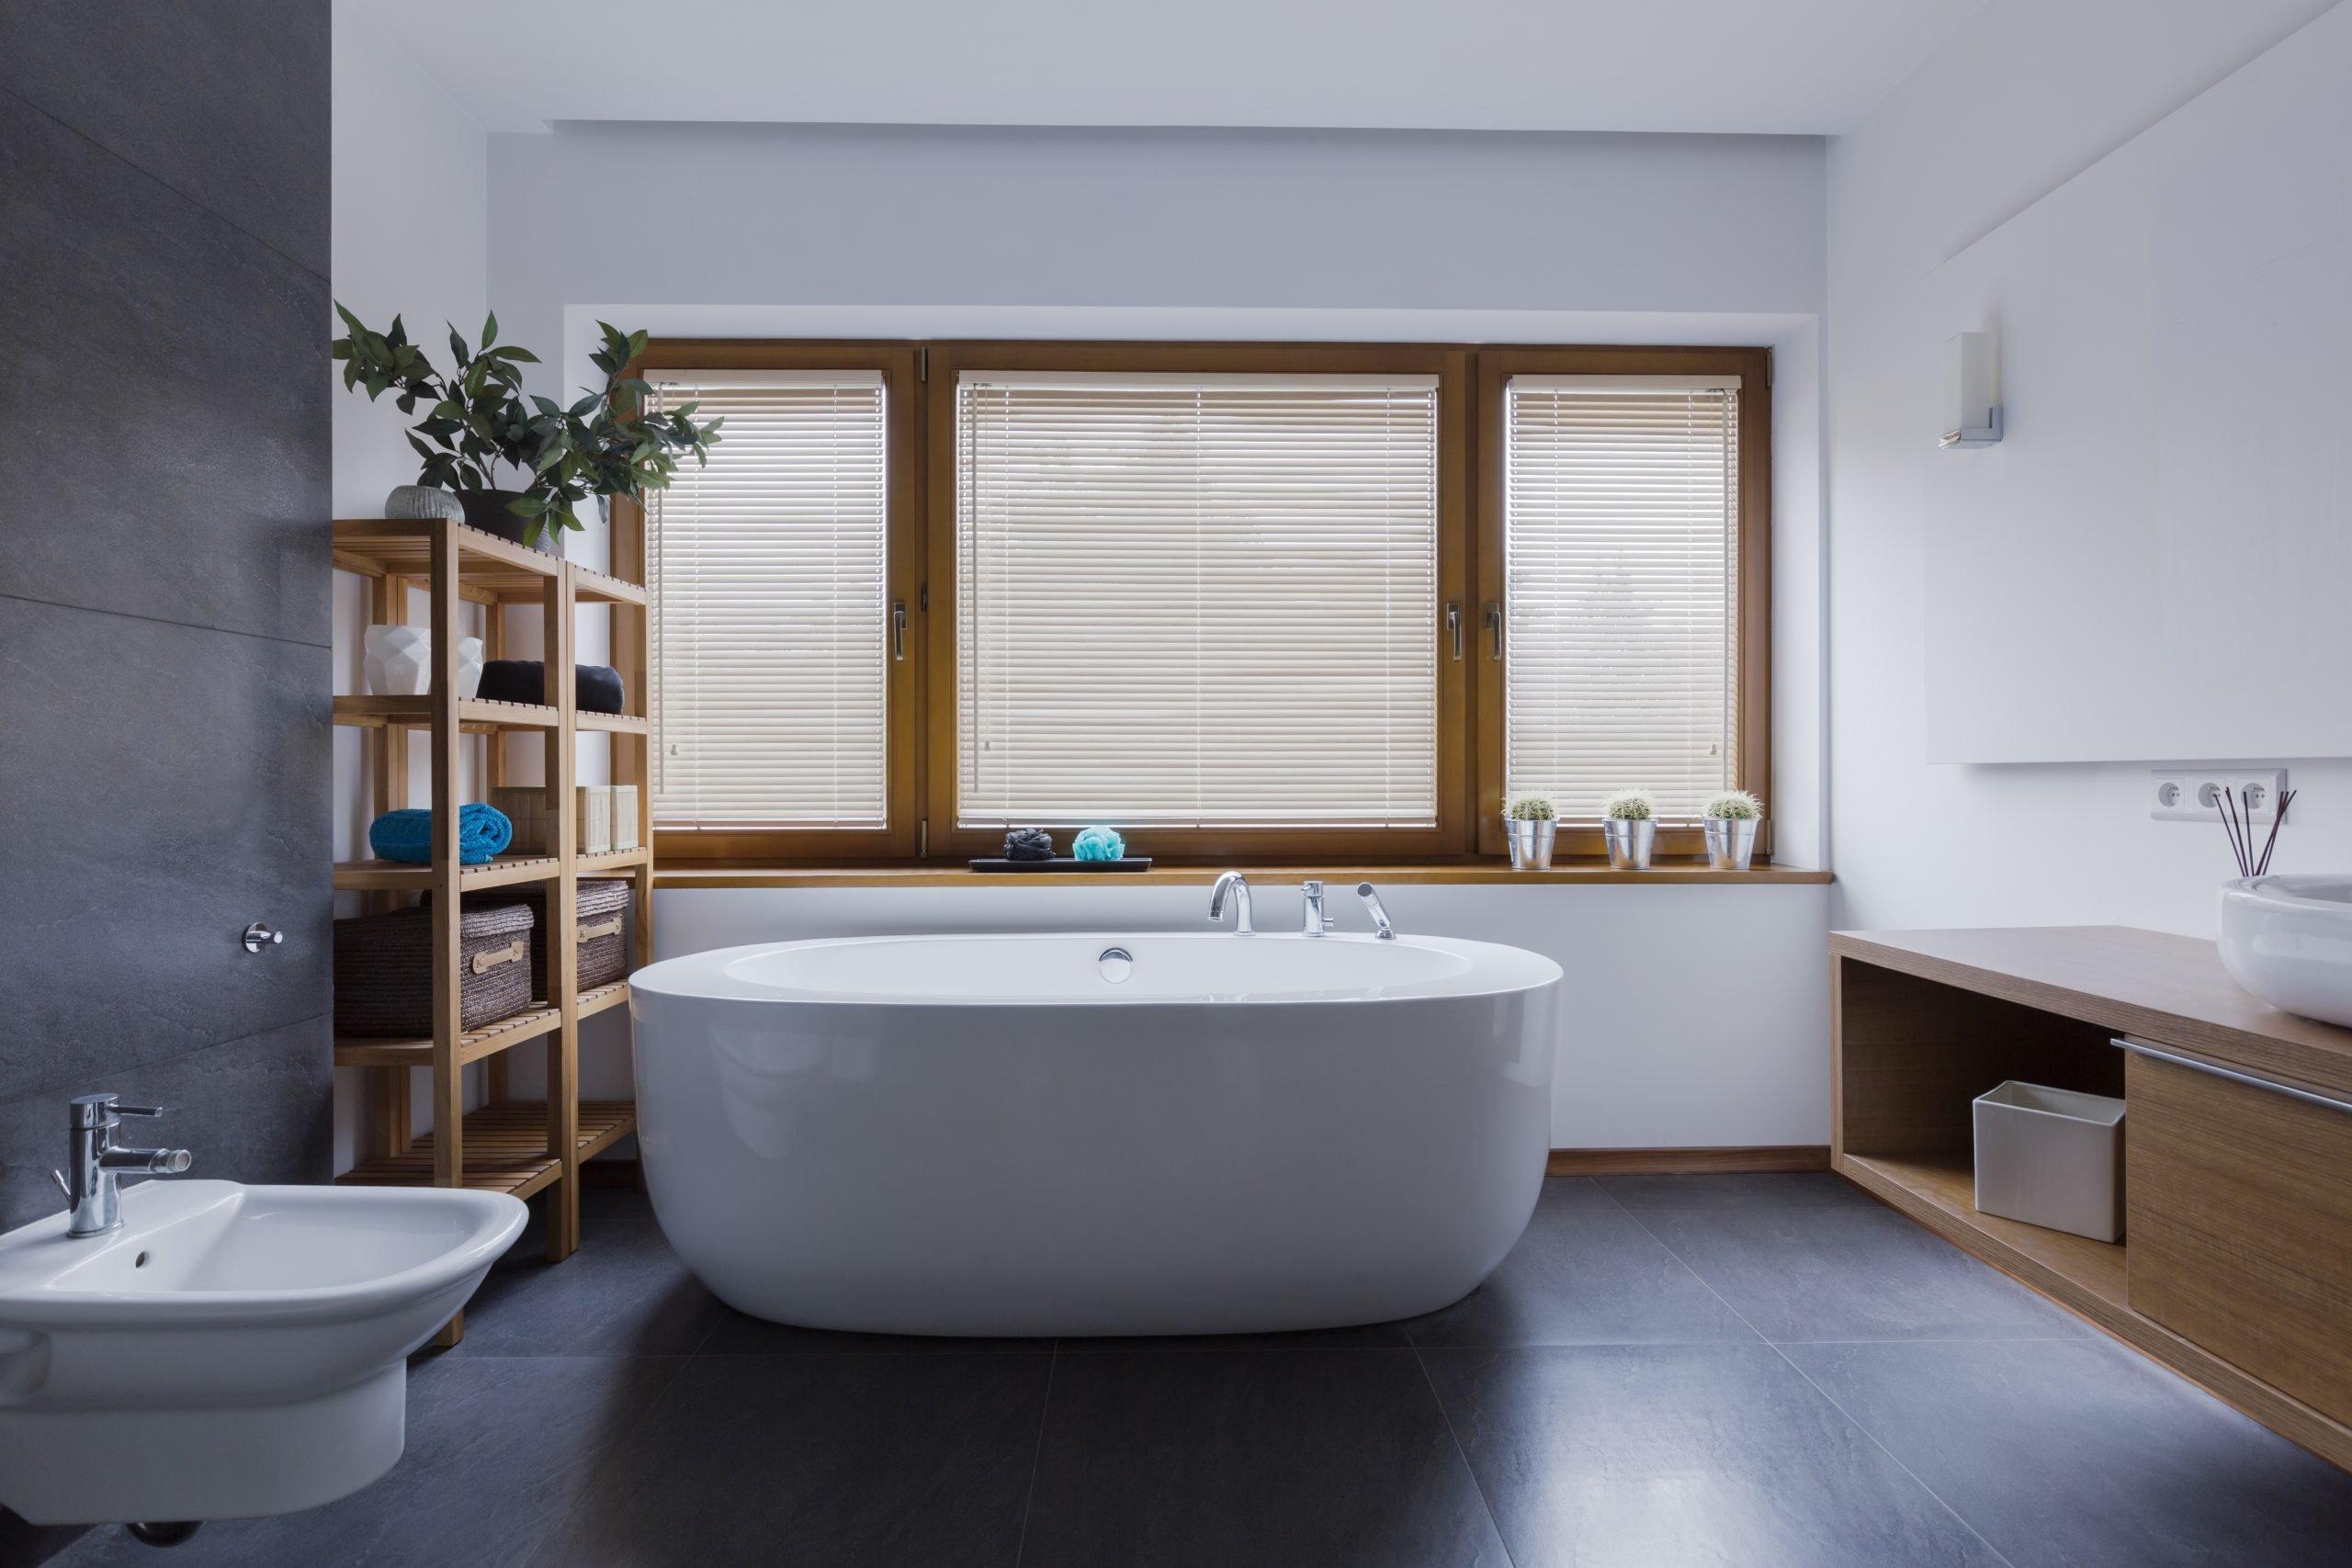 Spacious and comfortable bathroom with freestanding bathtub